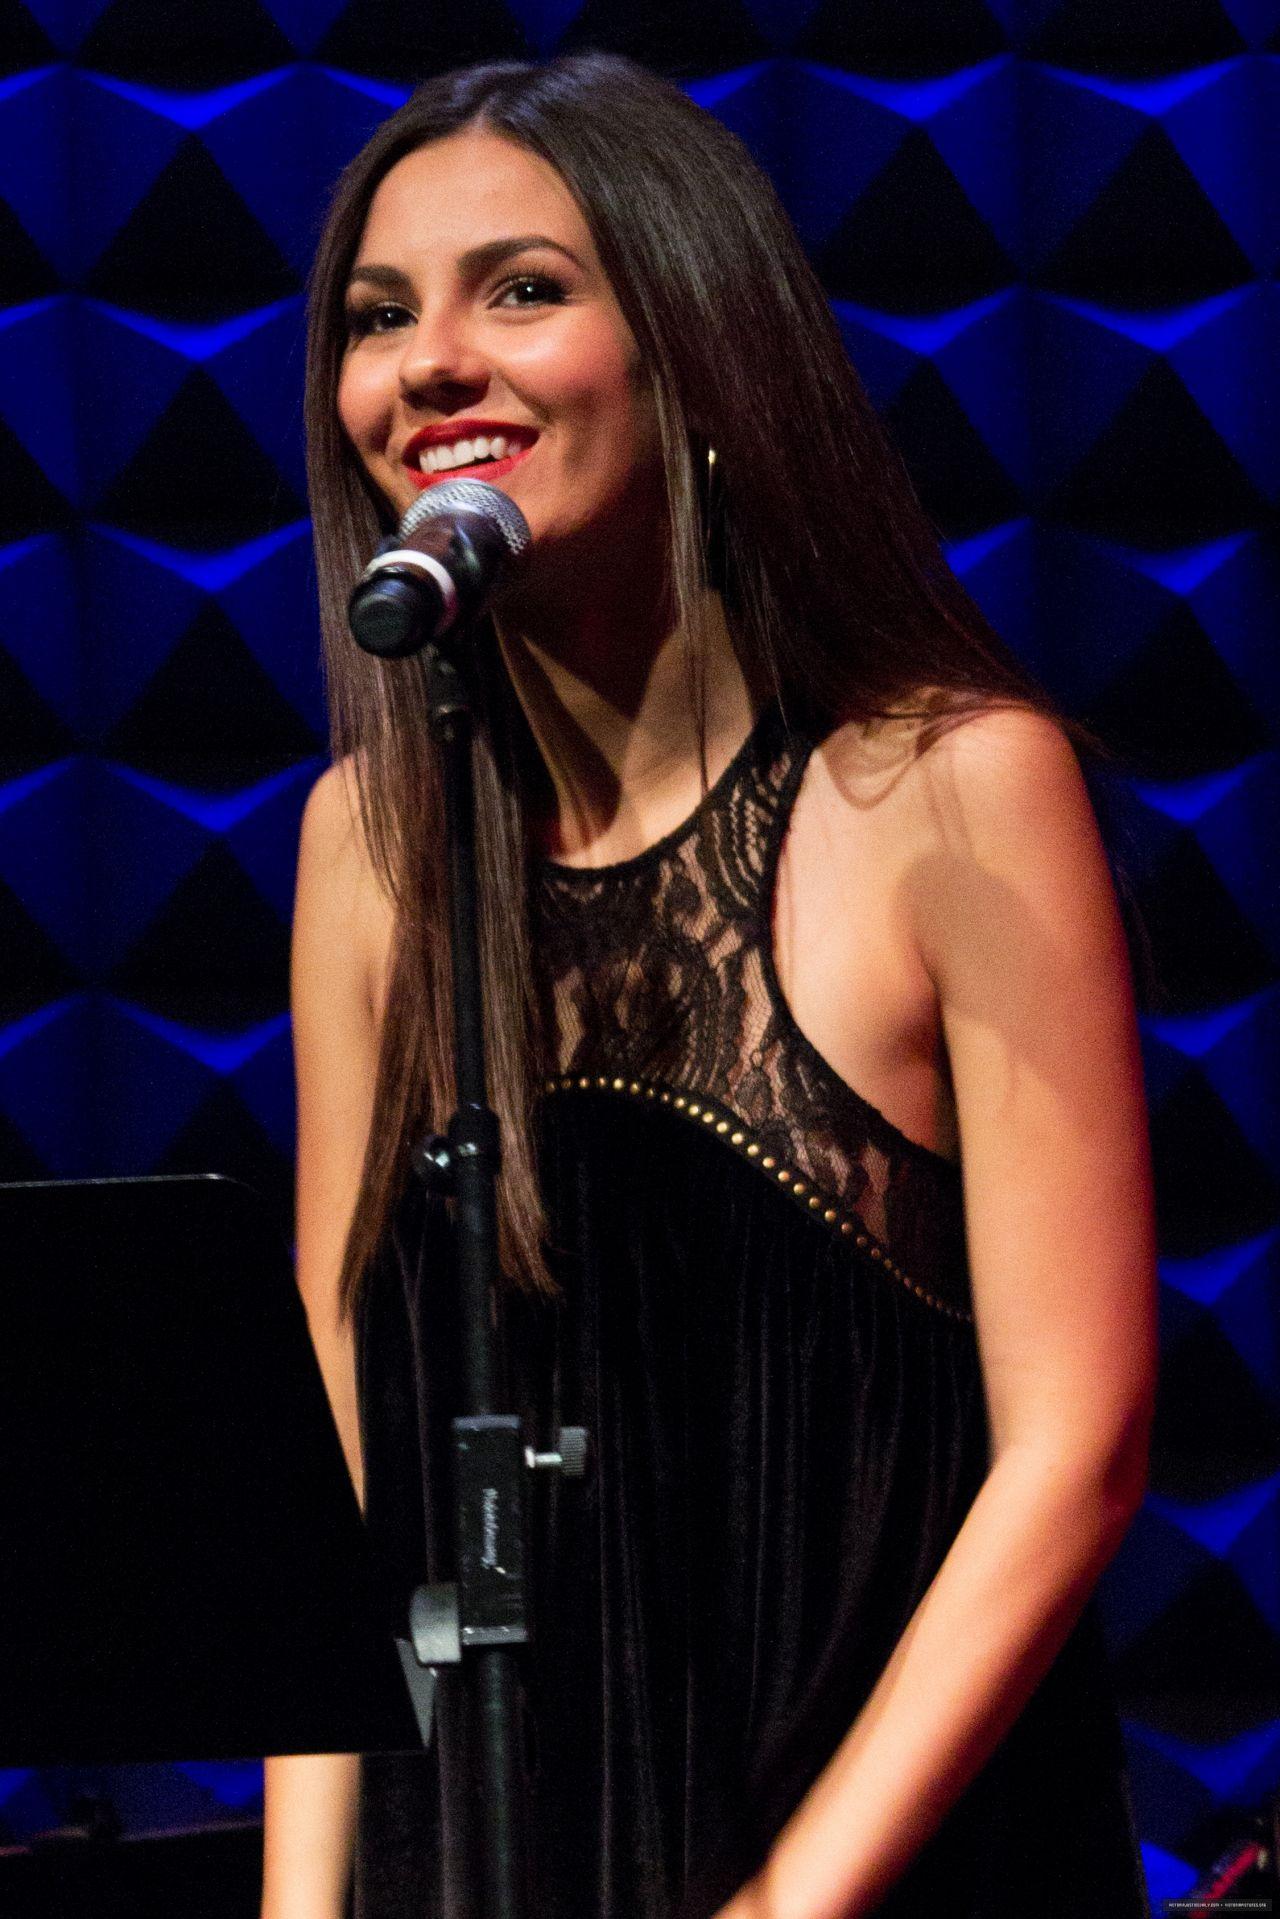 Victoria Justice - Performing at Joe